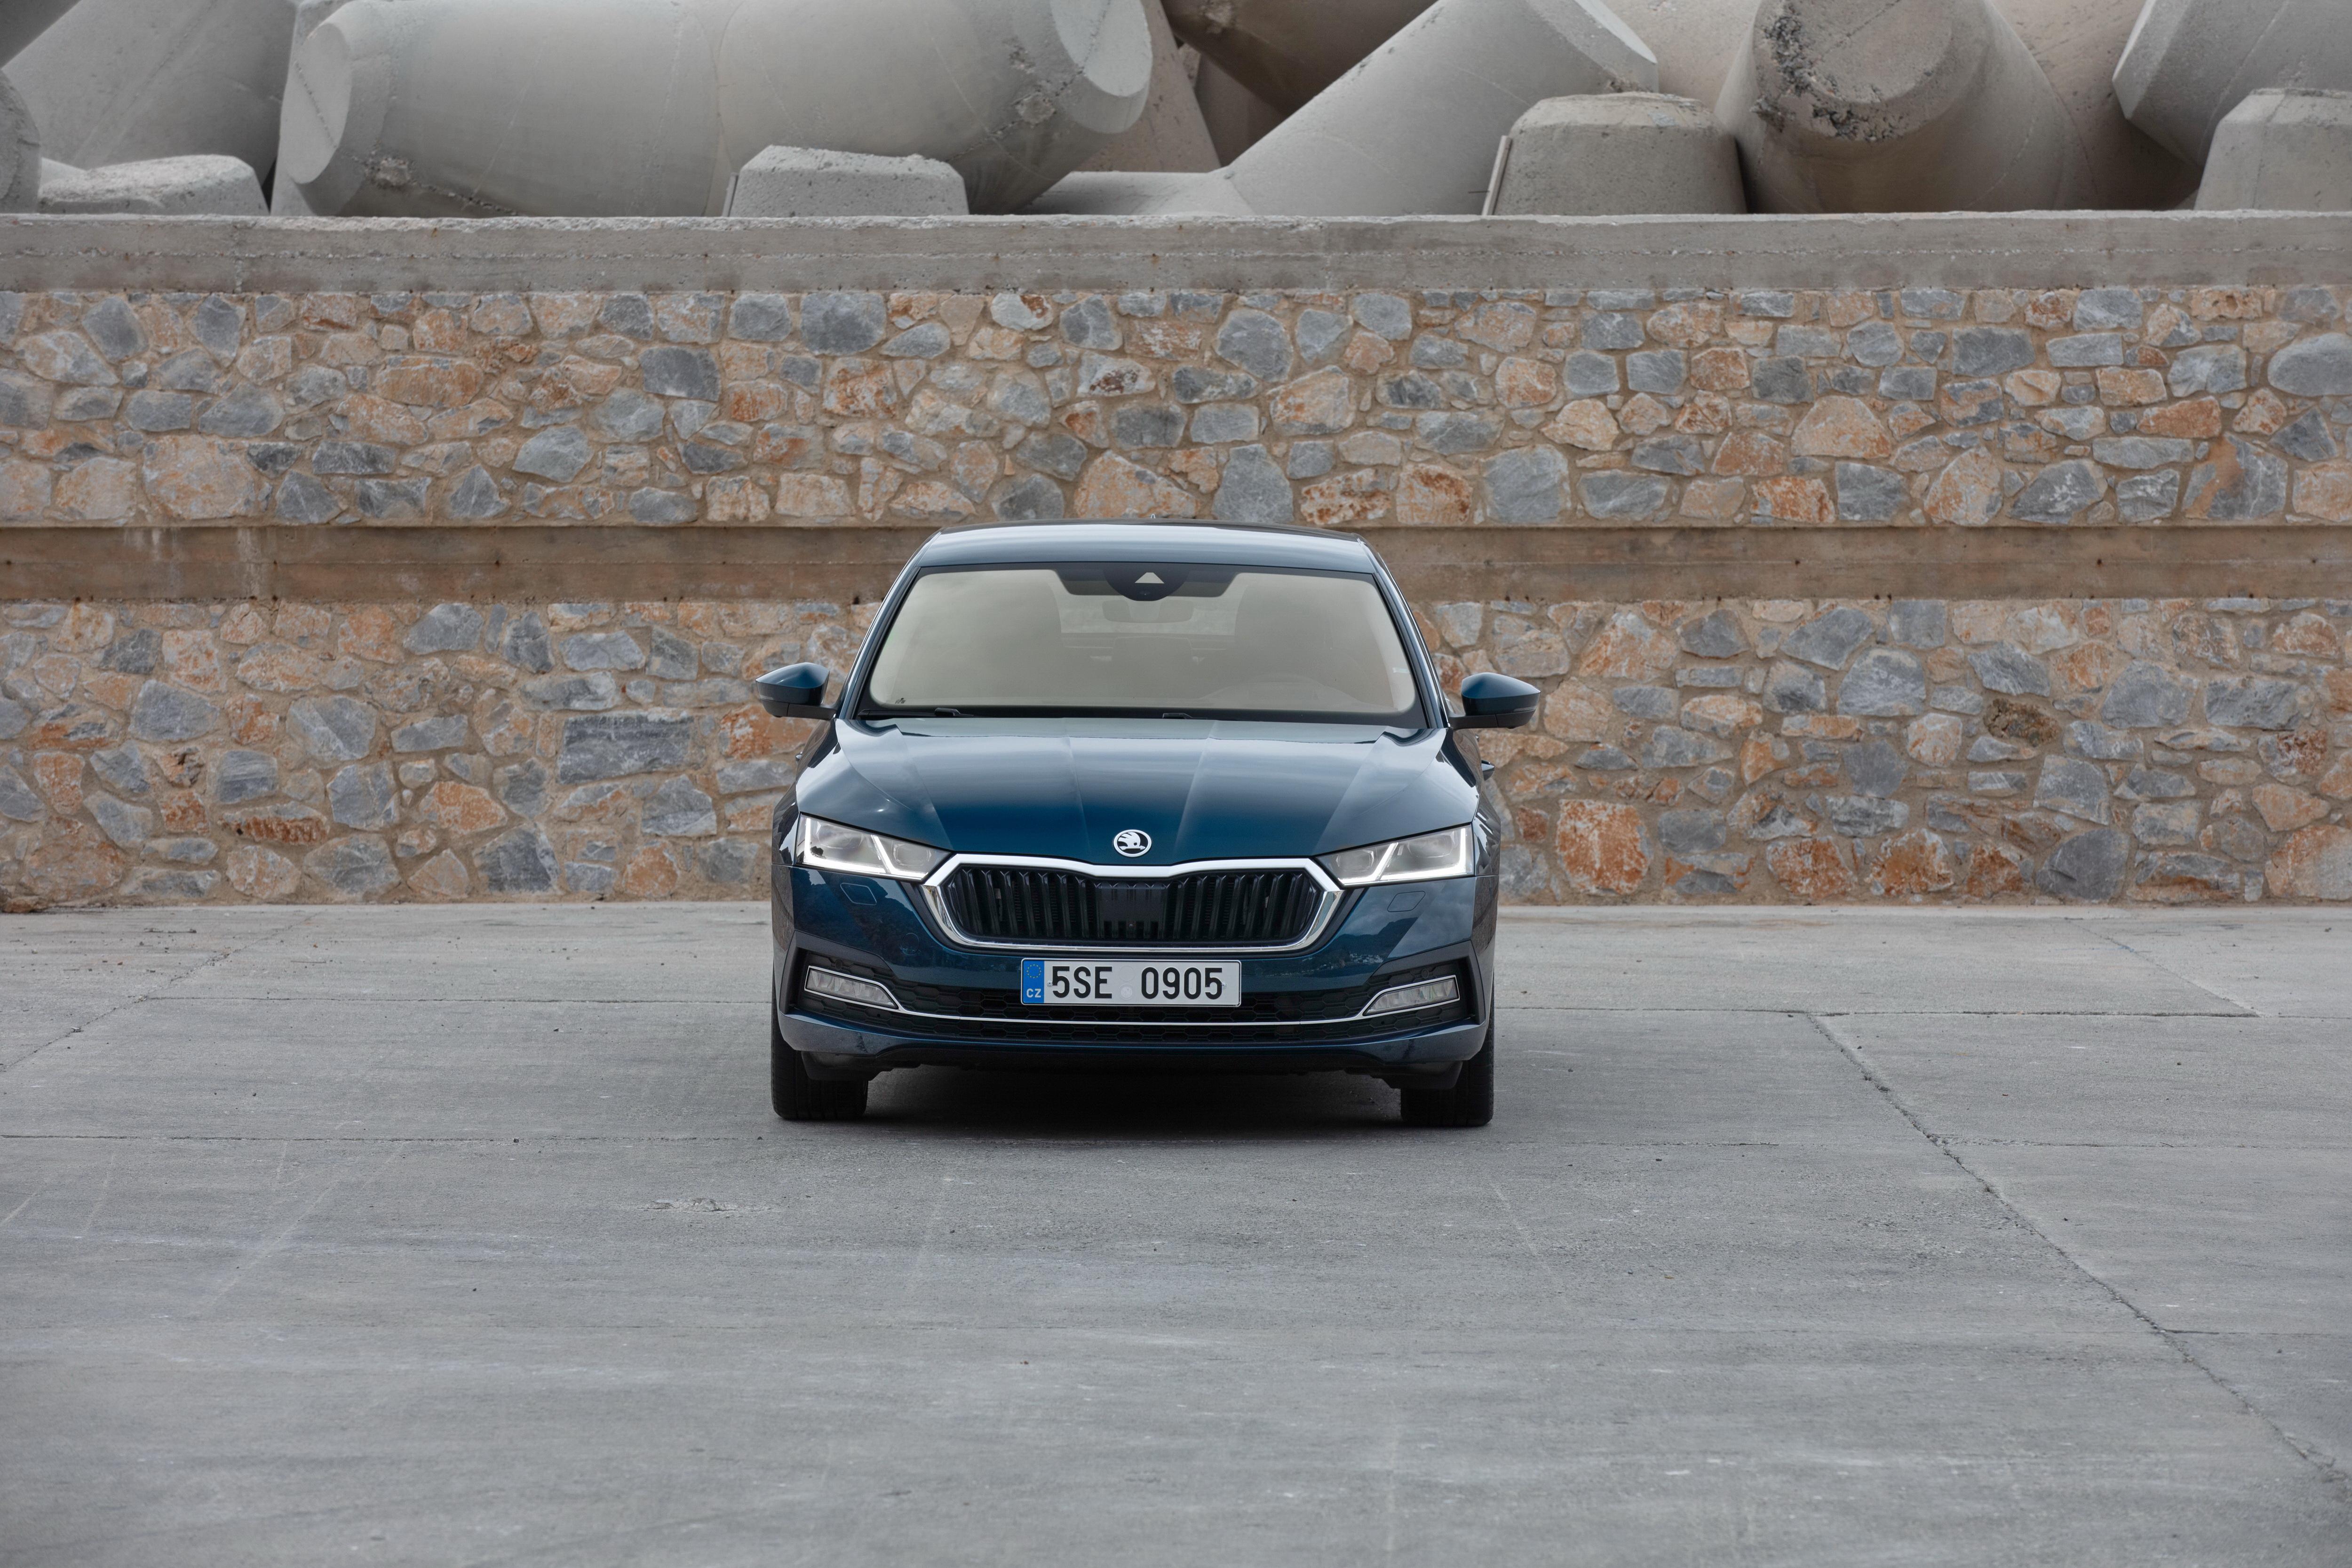 The all-new SKODA OCTAVIA: spacious, practical and elegant like a coupé - Image 1